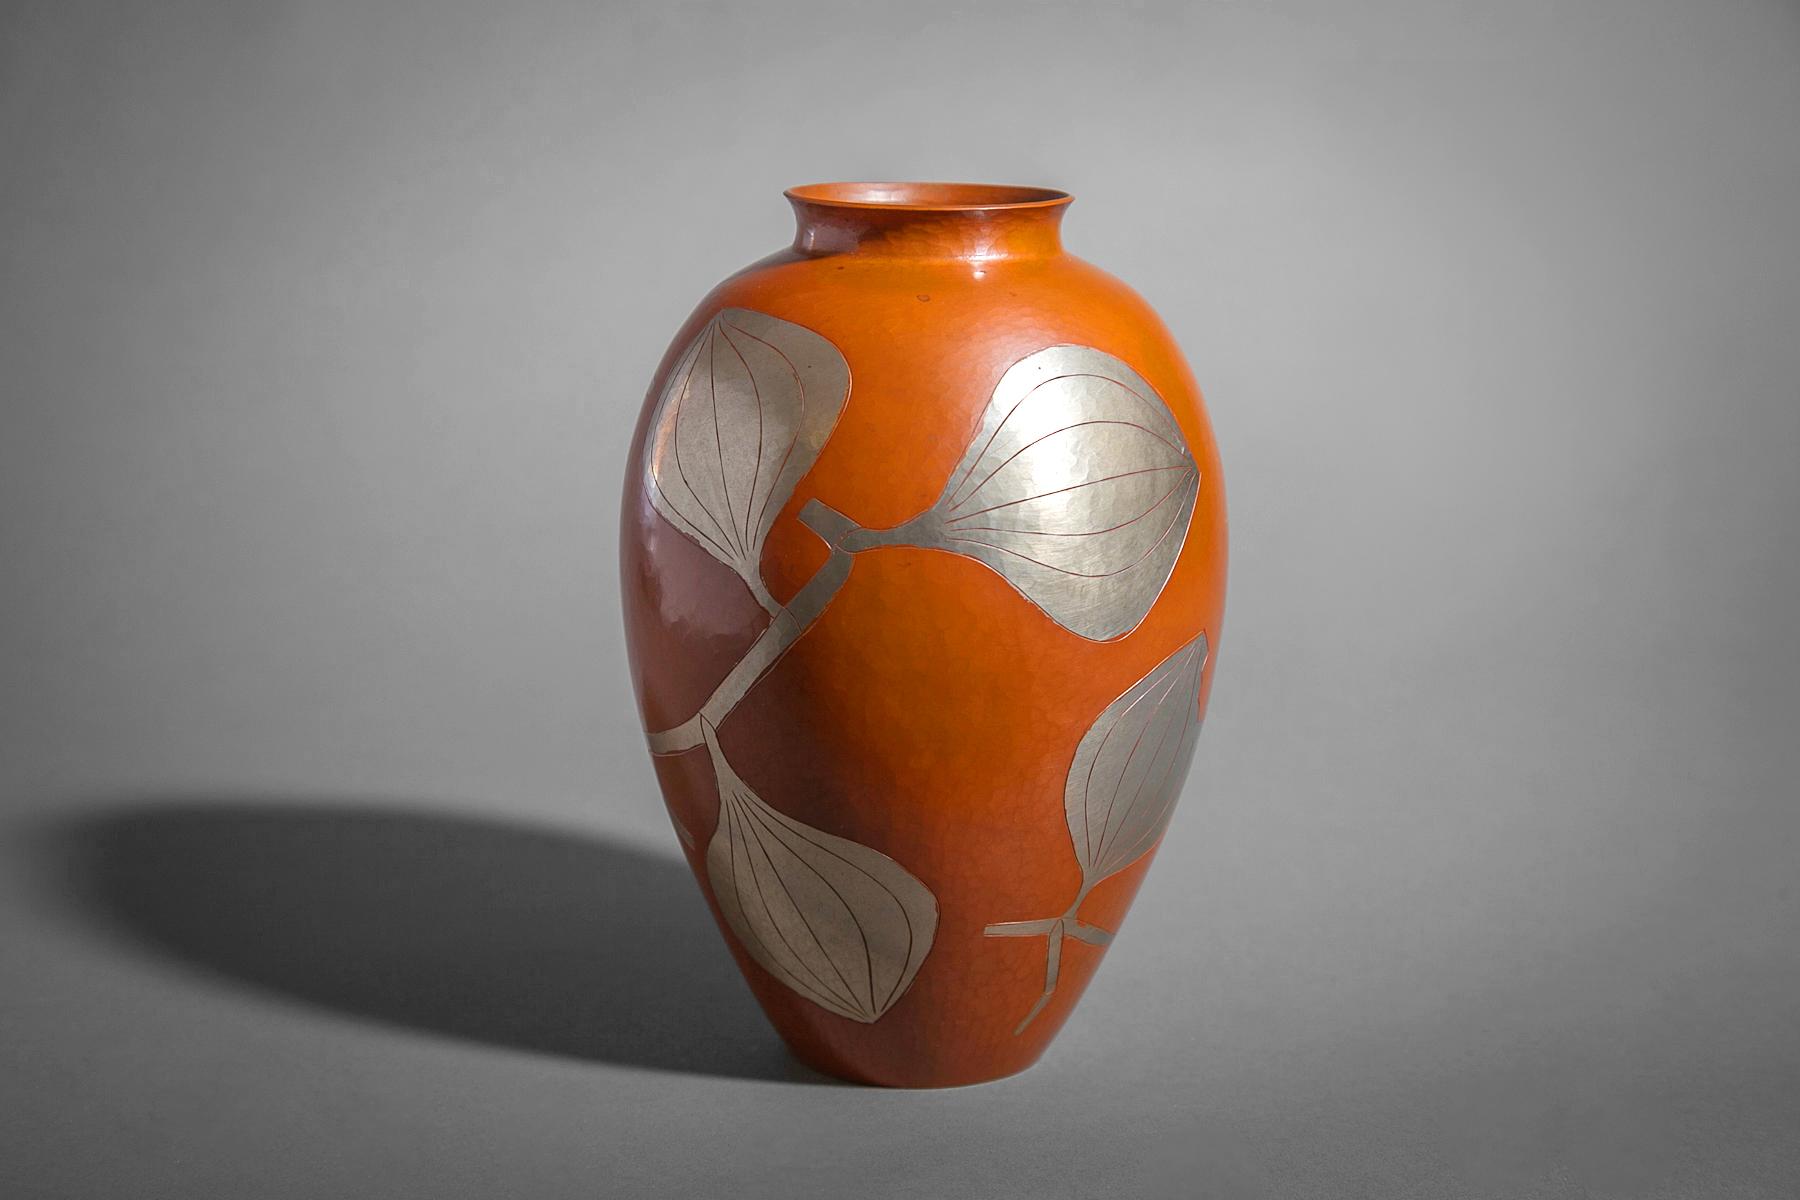 Hammered Copper Vase with Silver Leaves Design